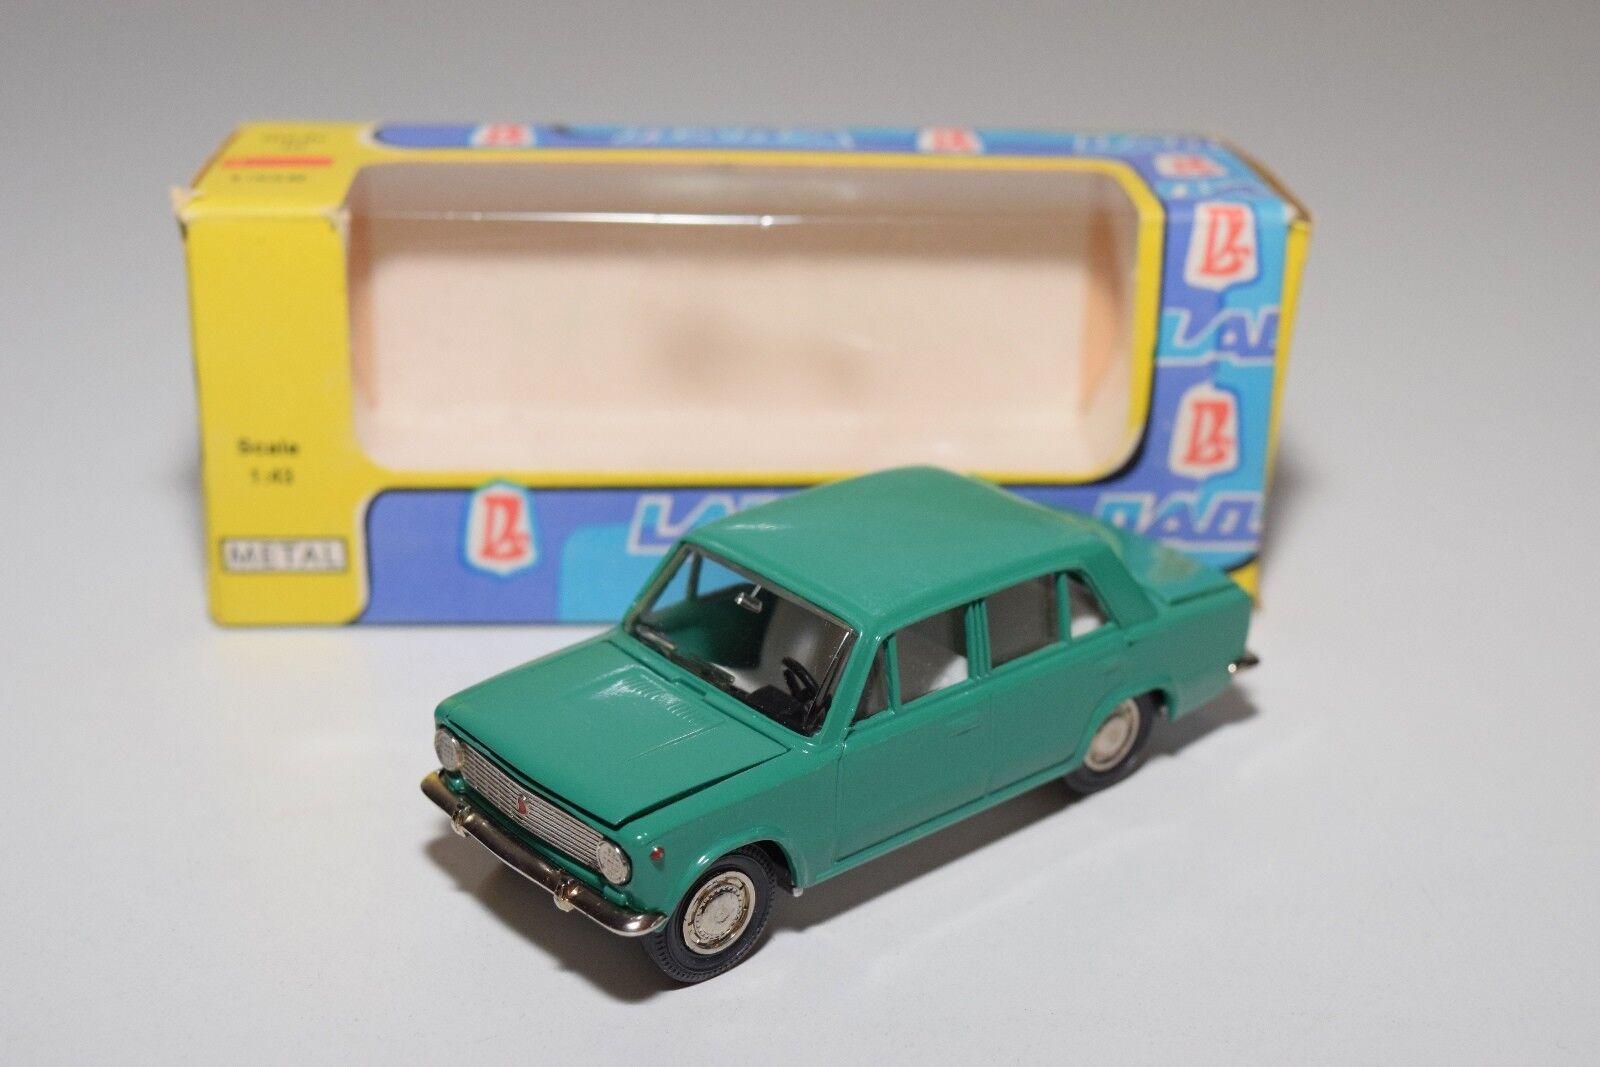 Russische auto cccp novoexport udssr lada 2101 a9 grüner minze boxed selten wie selten ( 5